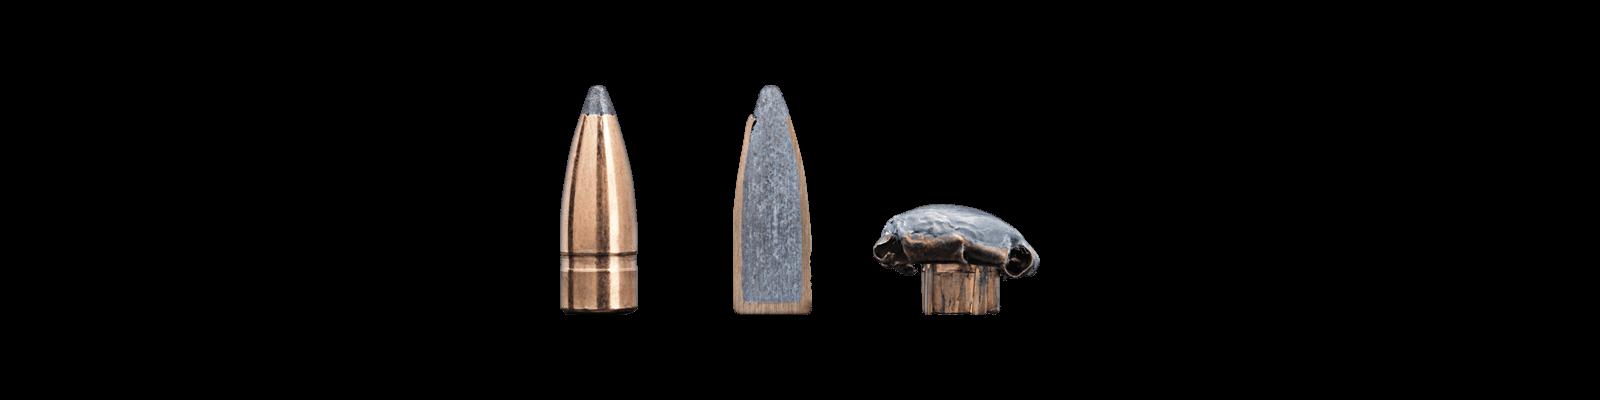 Sako 223 Rem Gamehead 3,56g (110G)20 kpl / ras